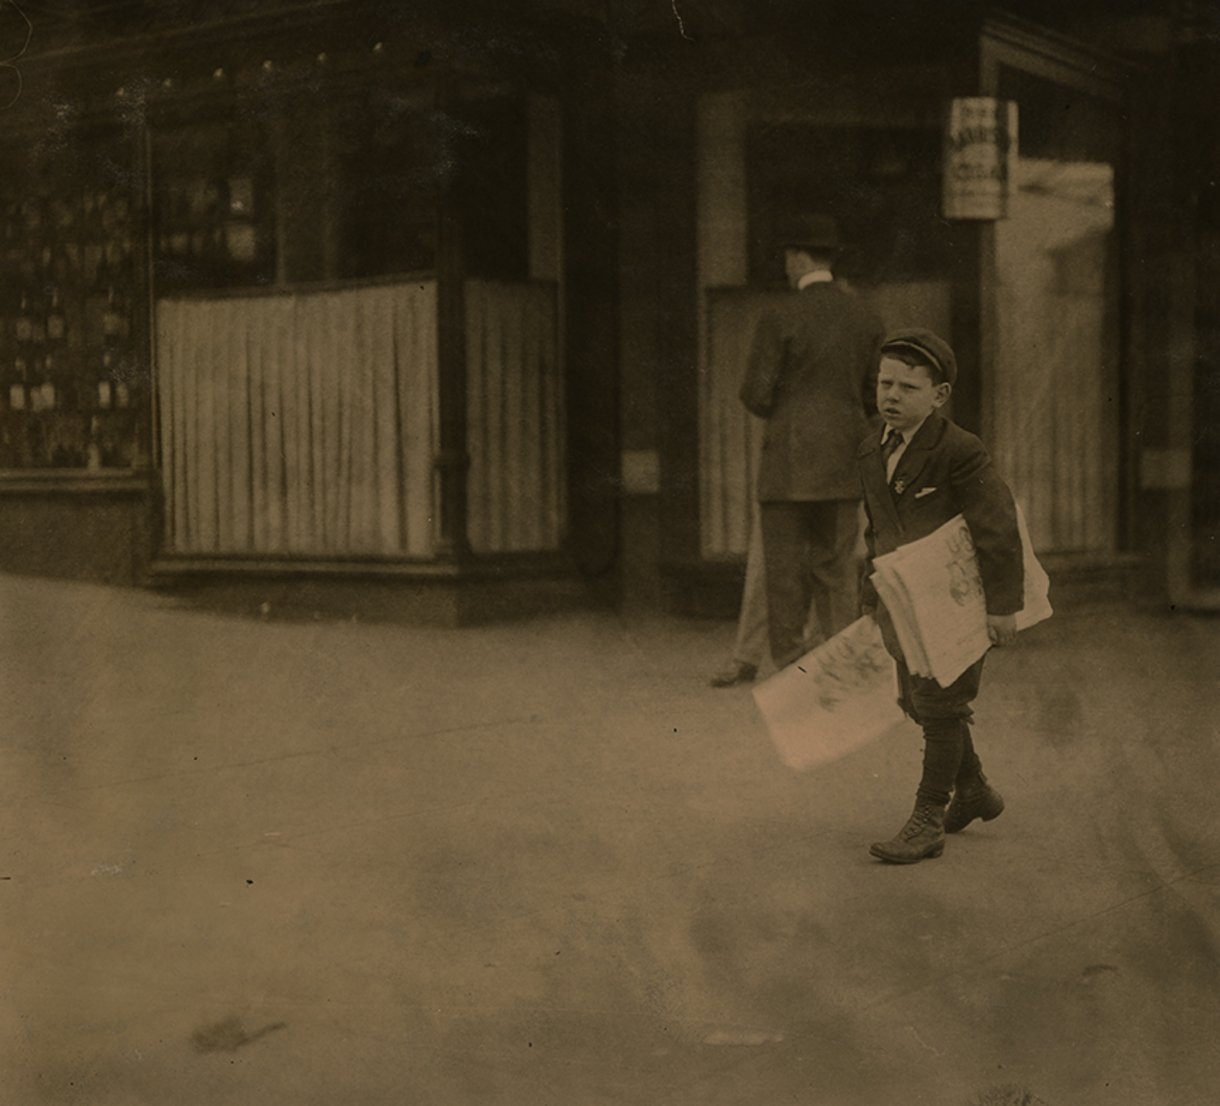 """Lewis Hine, Child Labor Investigator"" opens Feb. 6 at The Dorsky Museum"